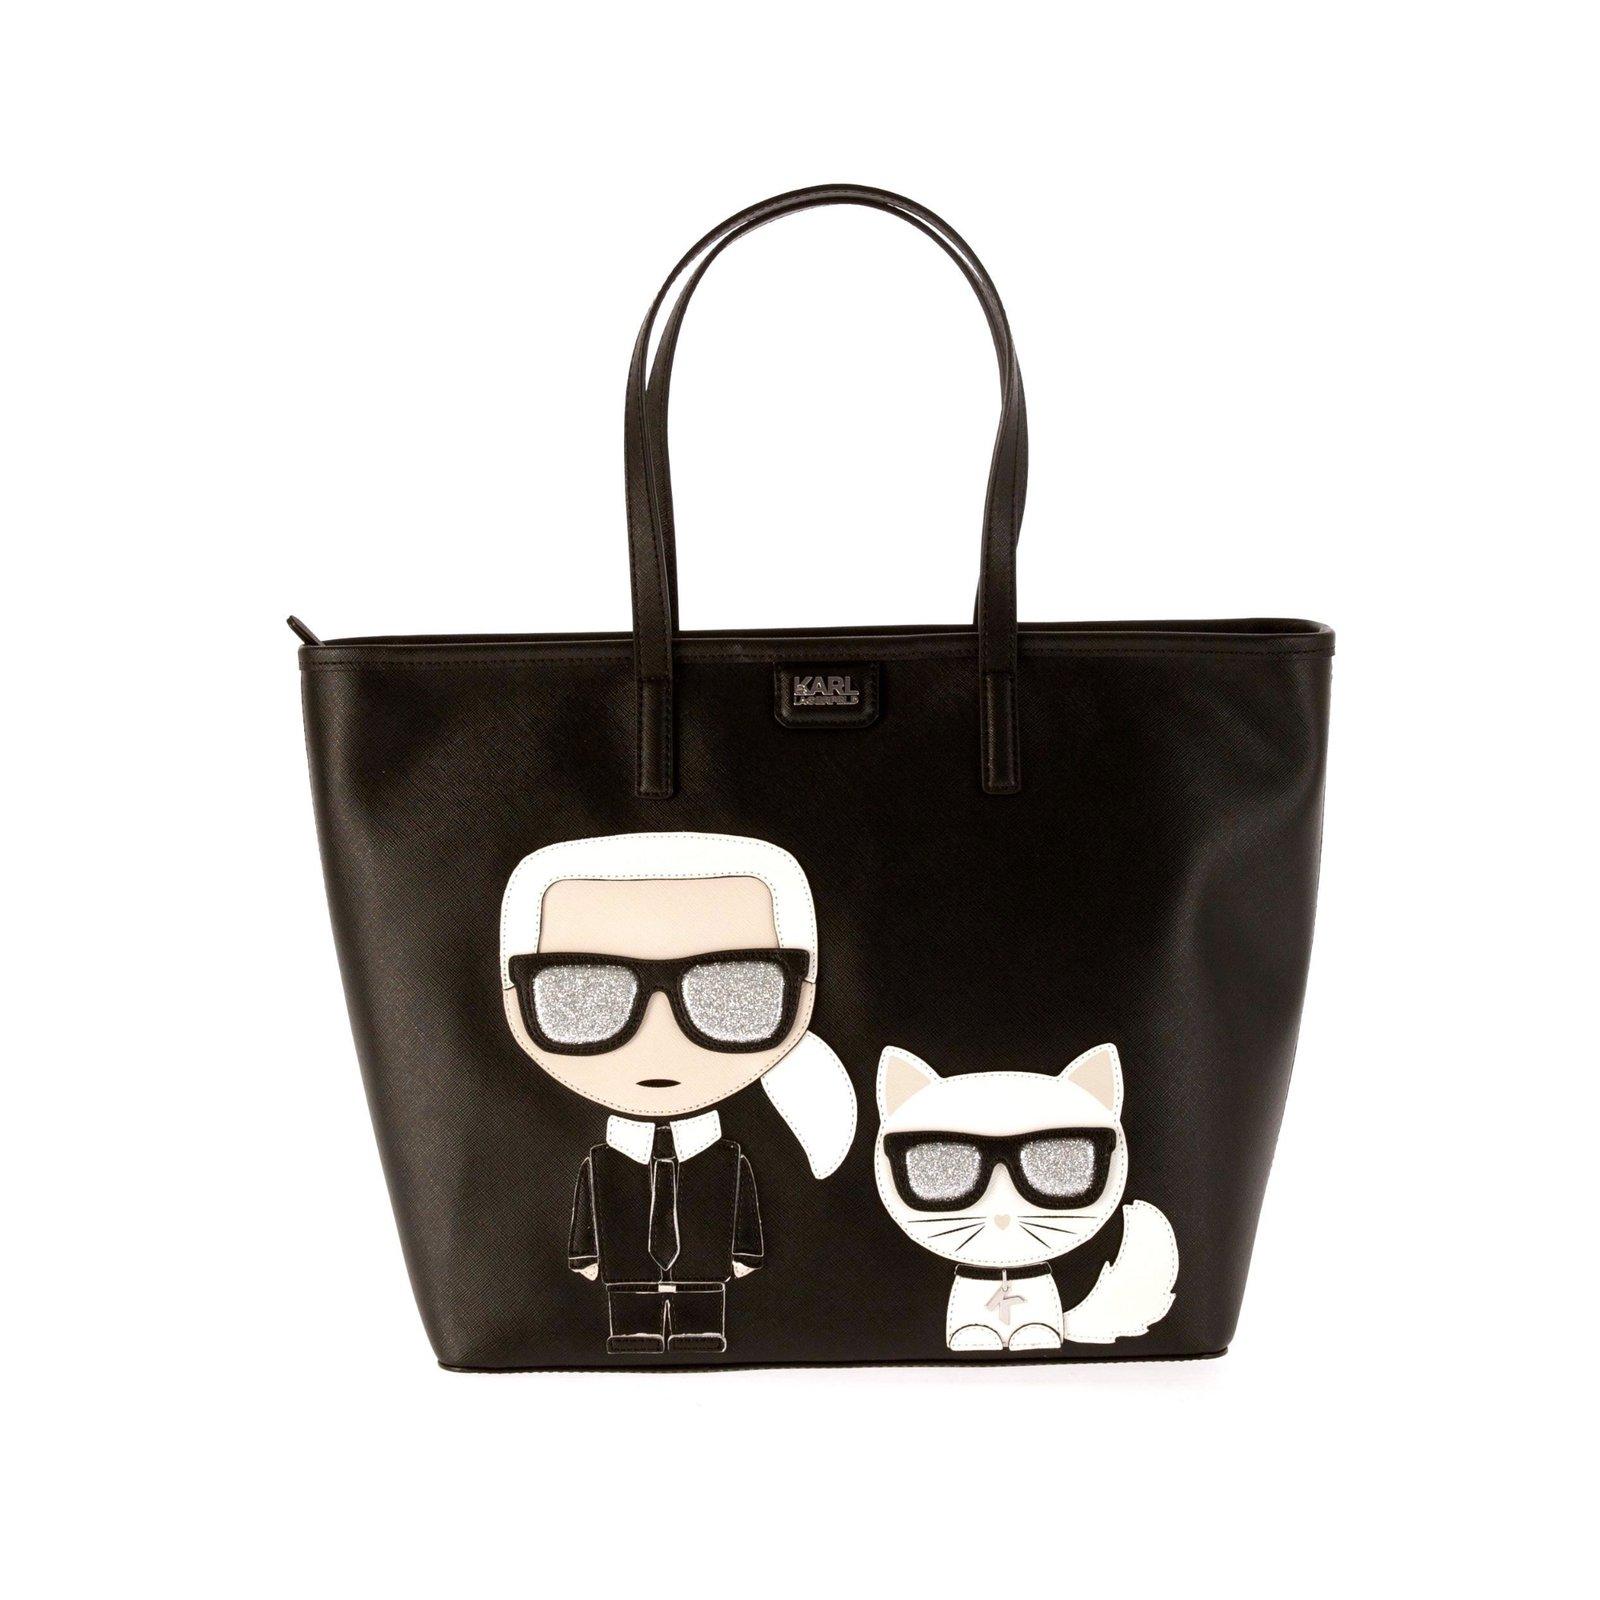 Karl Lagerfeld Handbag New Handbags Synthetic Black Ref 65514